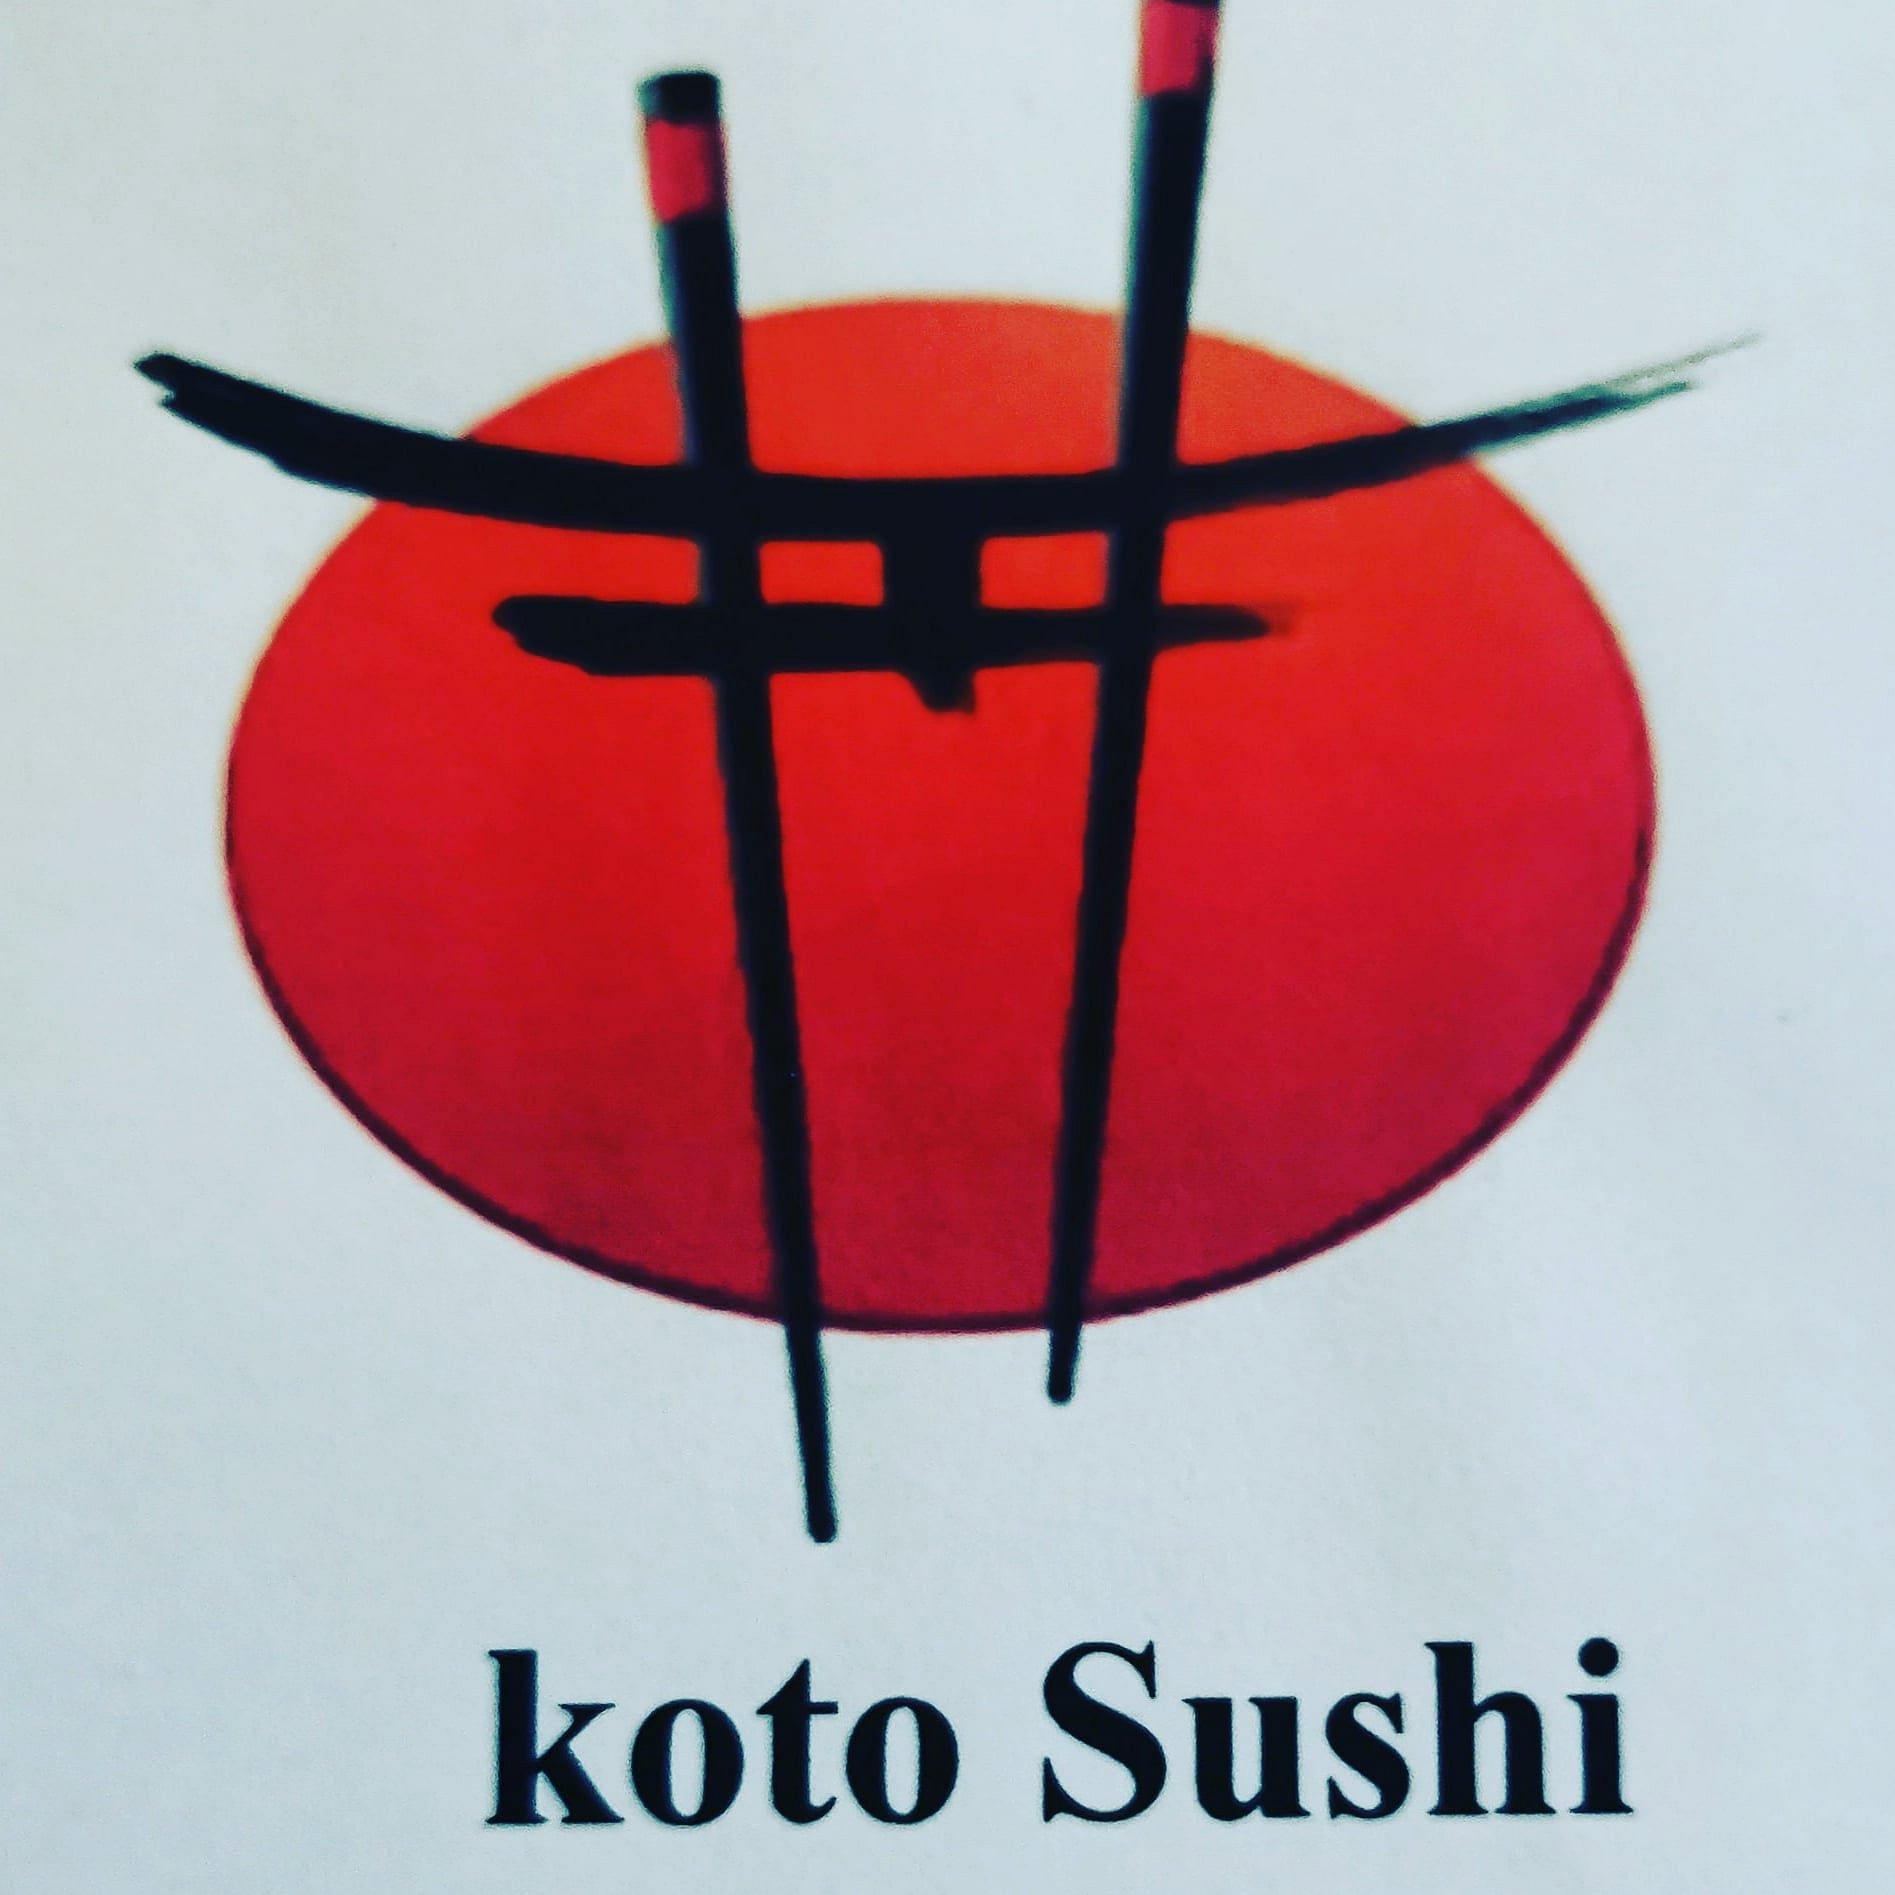 Koto Sushi Snc